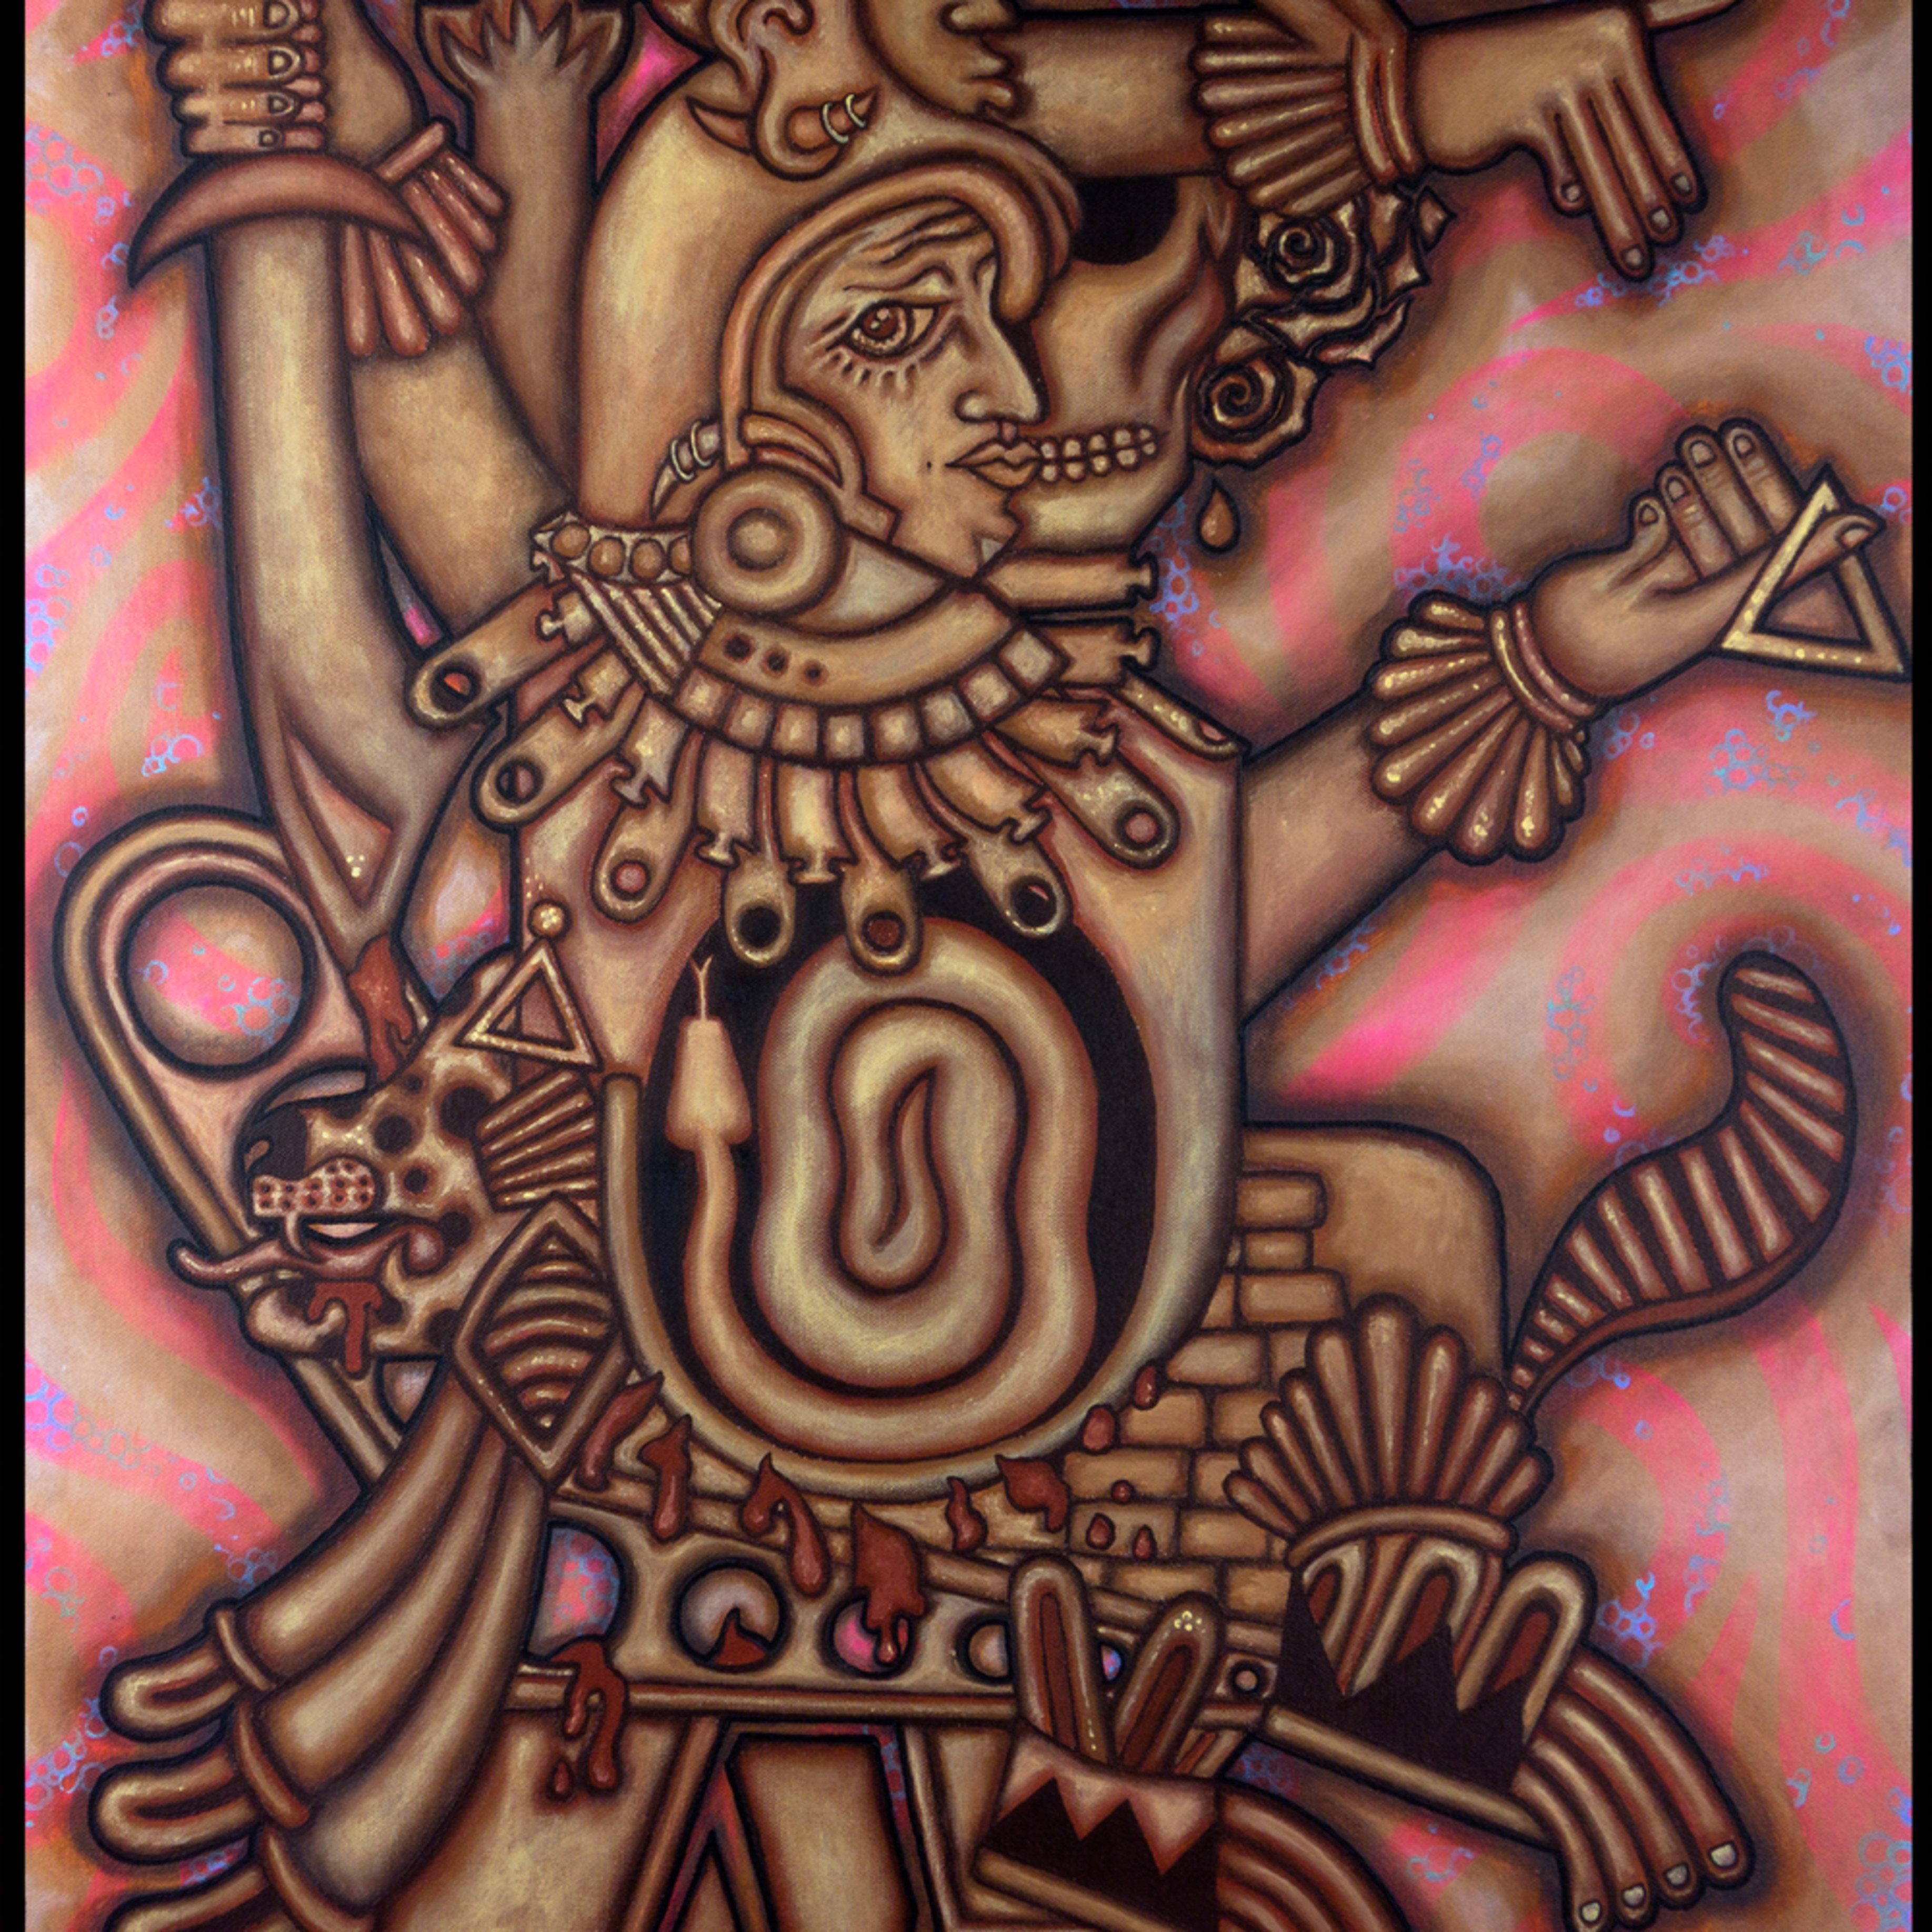 Serpent mother asf iiowvs